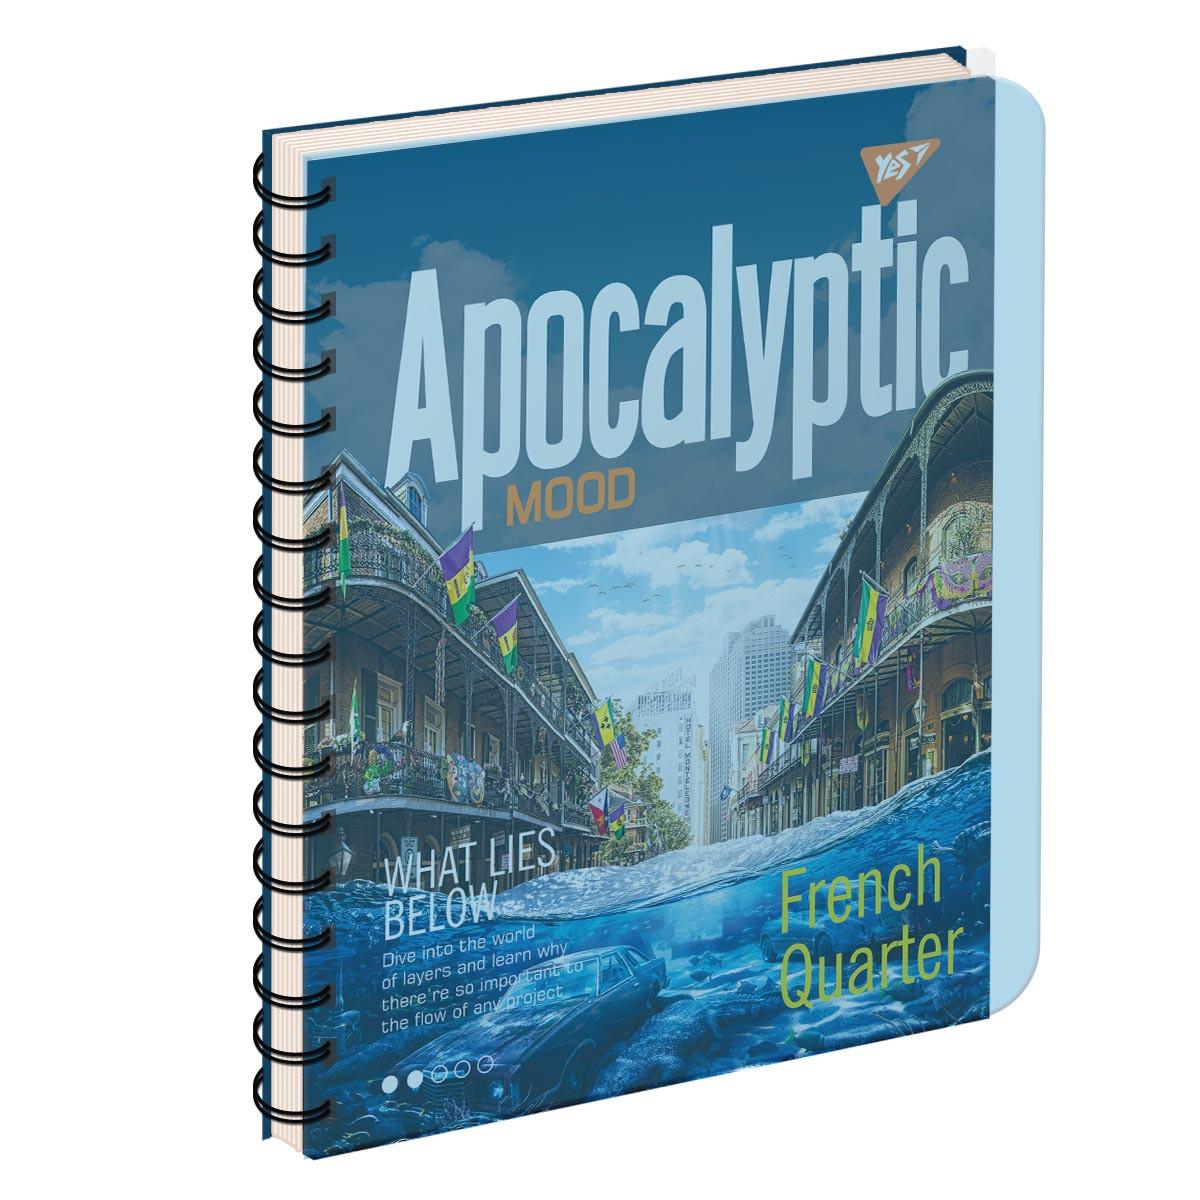 Тетрадь для записей А5/144 пл.обл. APOCALYPTIC YES код: 681680